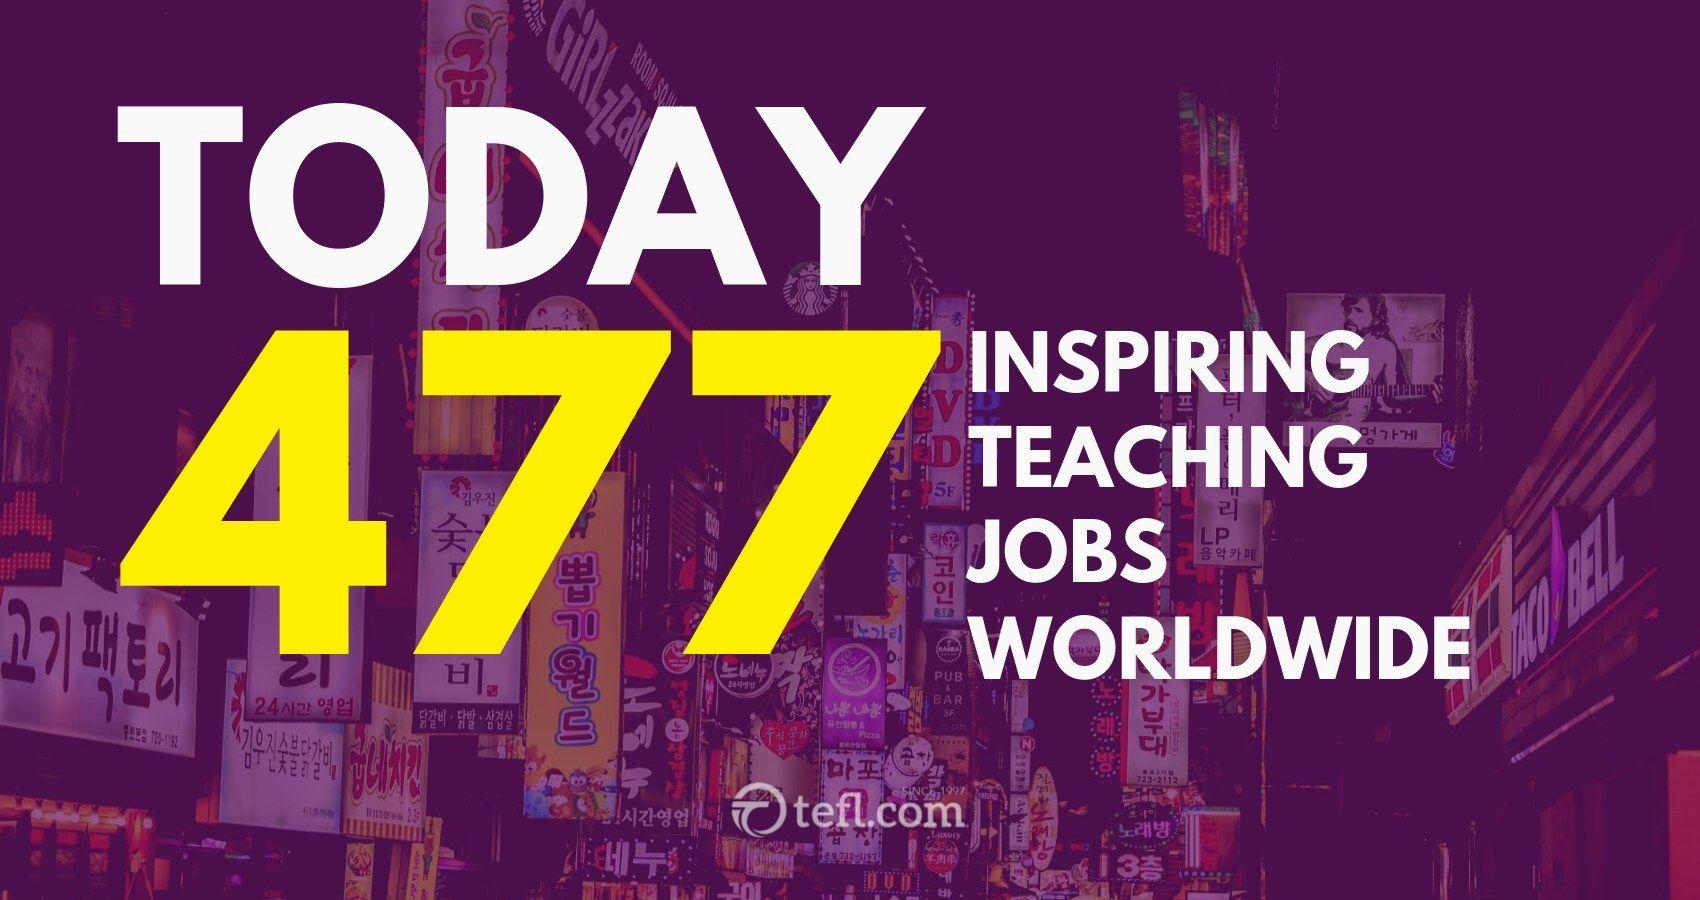 Inspiring worldwide teaching destinations download this